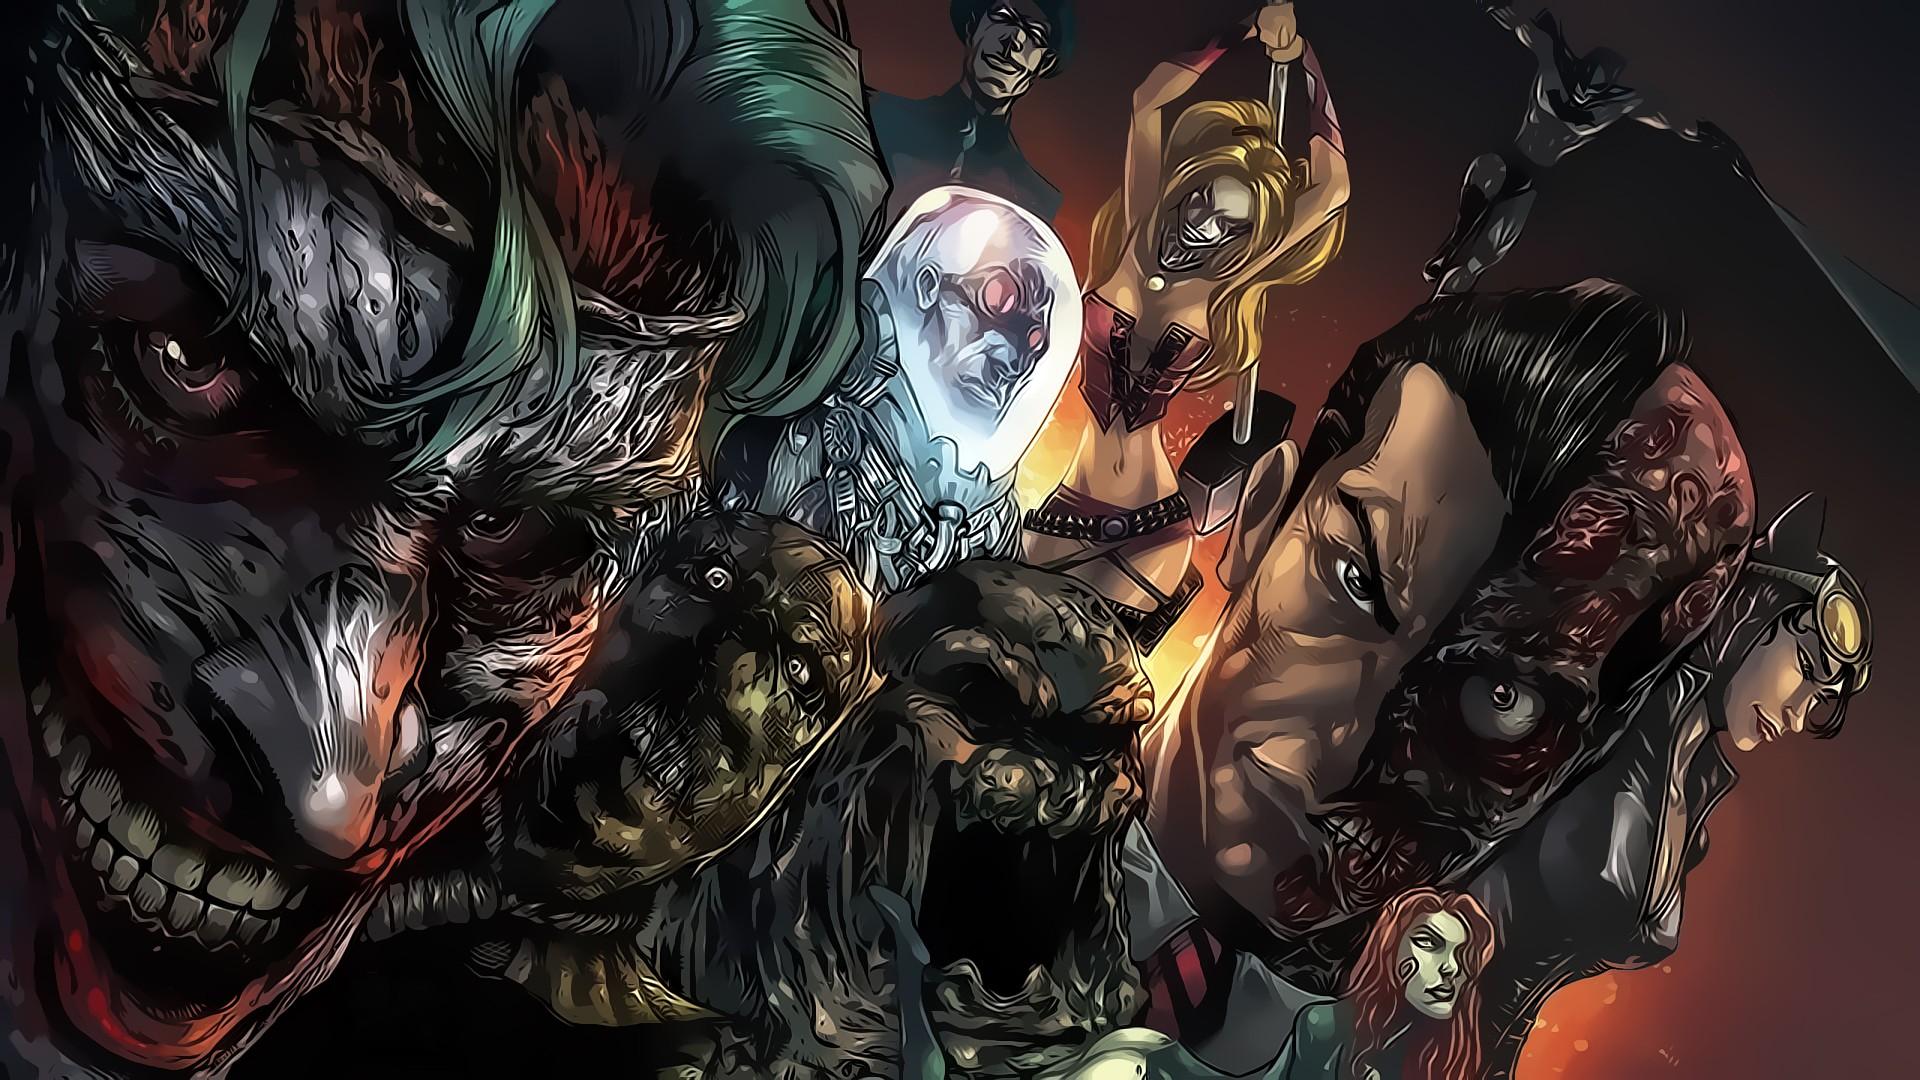 Злодеи из комиксов картинки